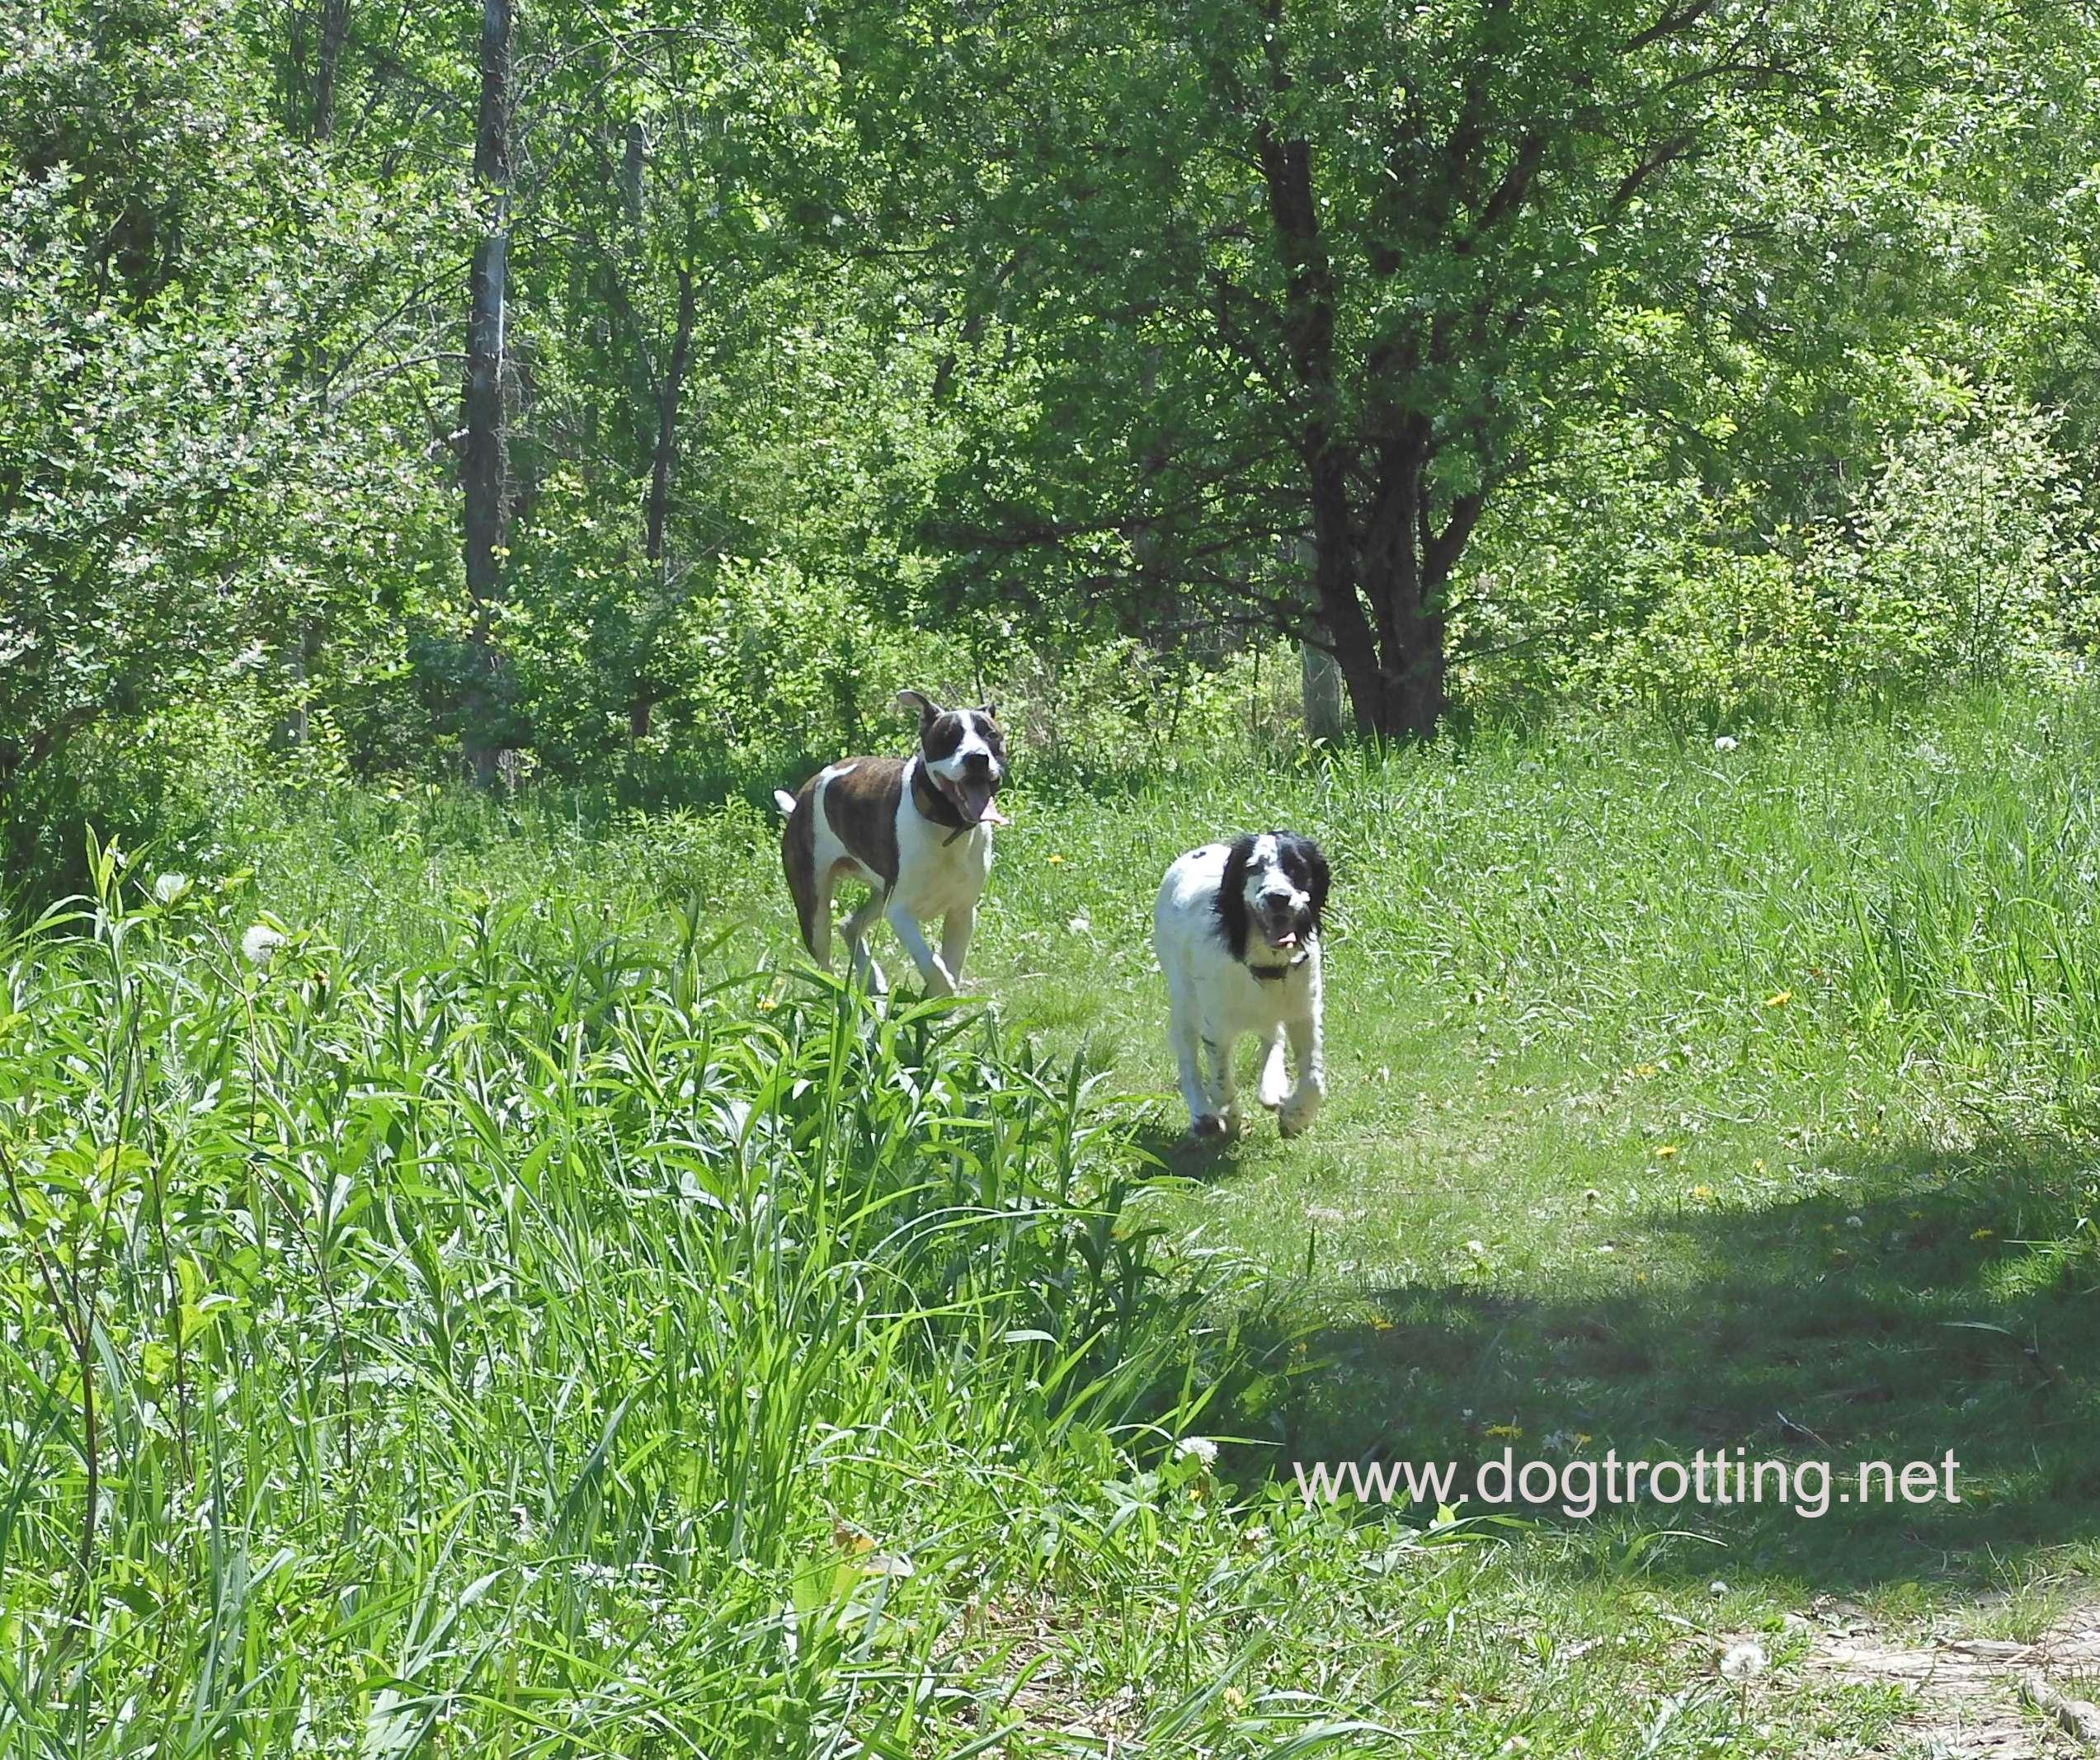 big dog running after little white and black dog off leash in Howler's Park dog park